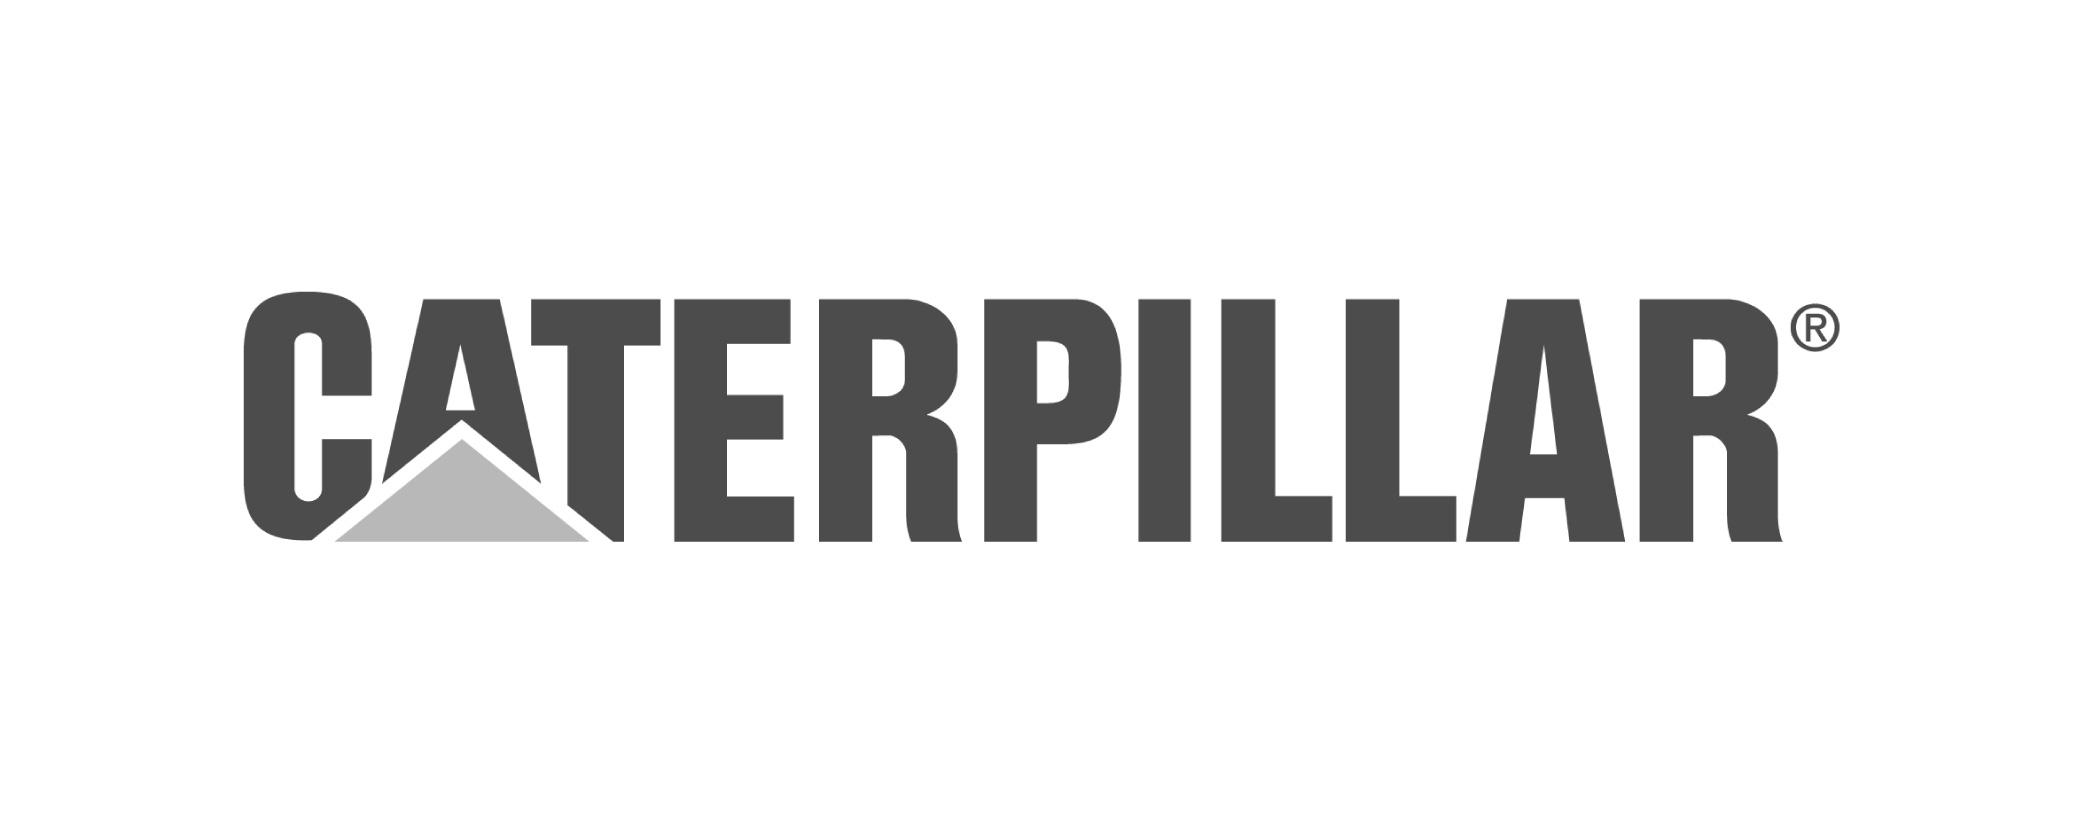 Caterpillar Grey 500 x 200-01.jpg